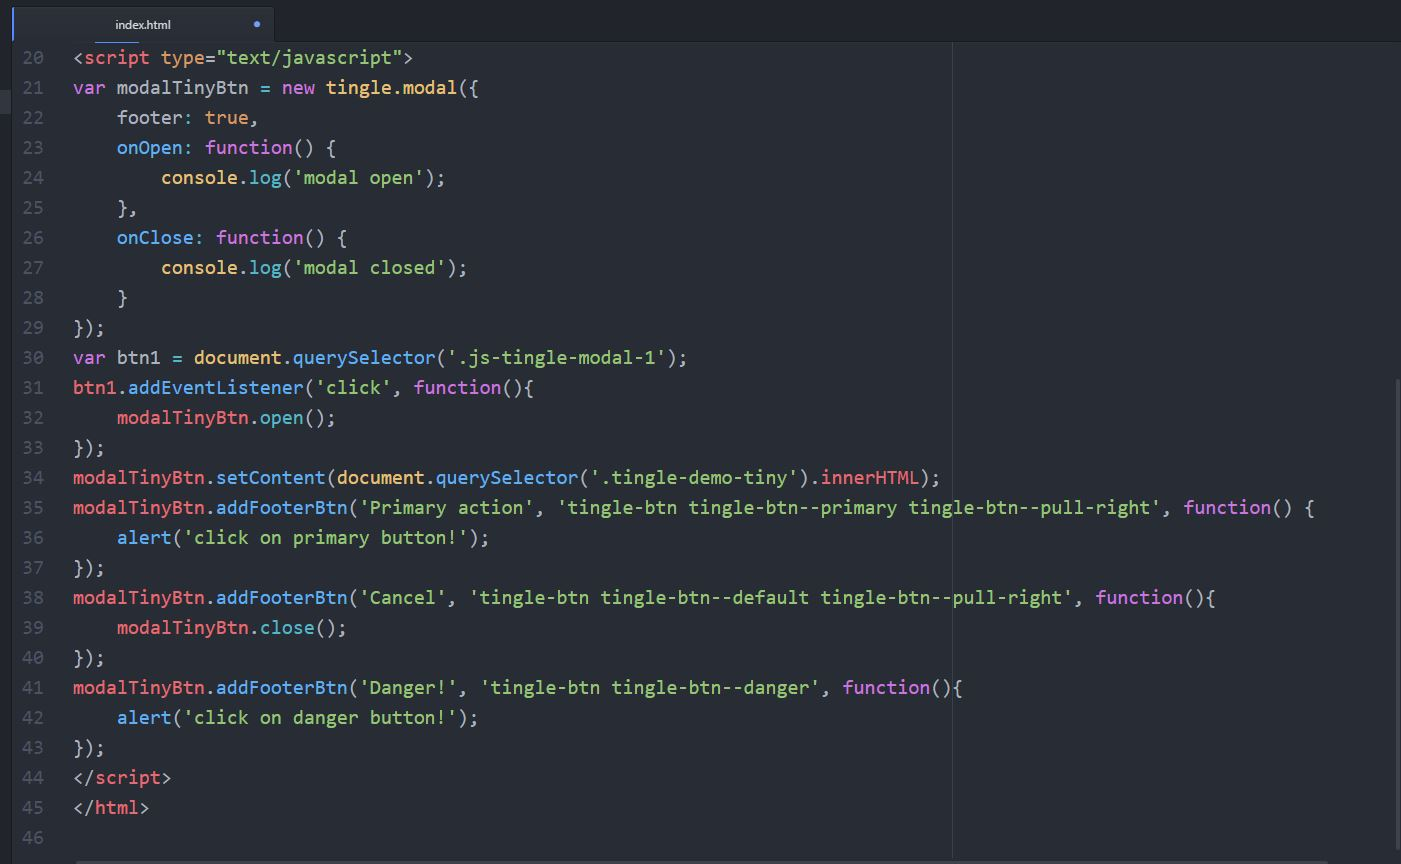 javascriptcode